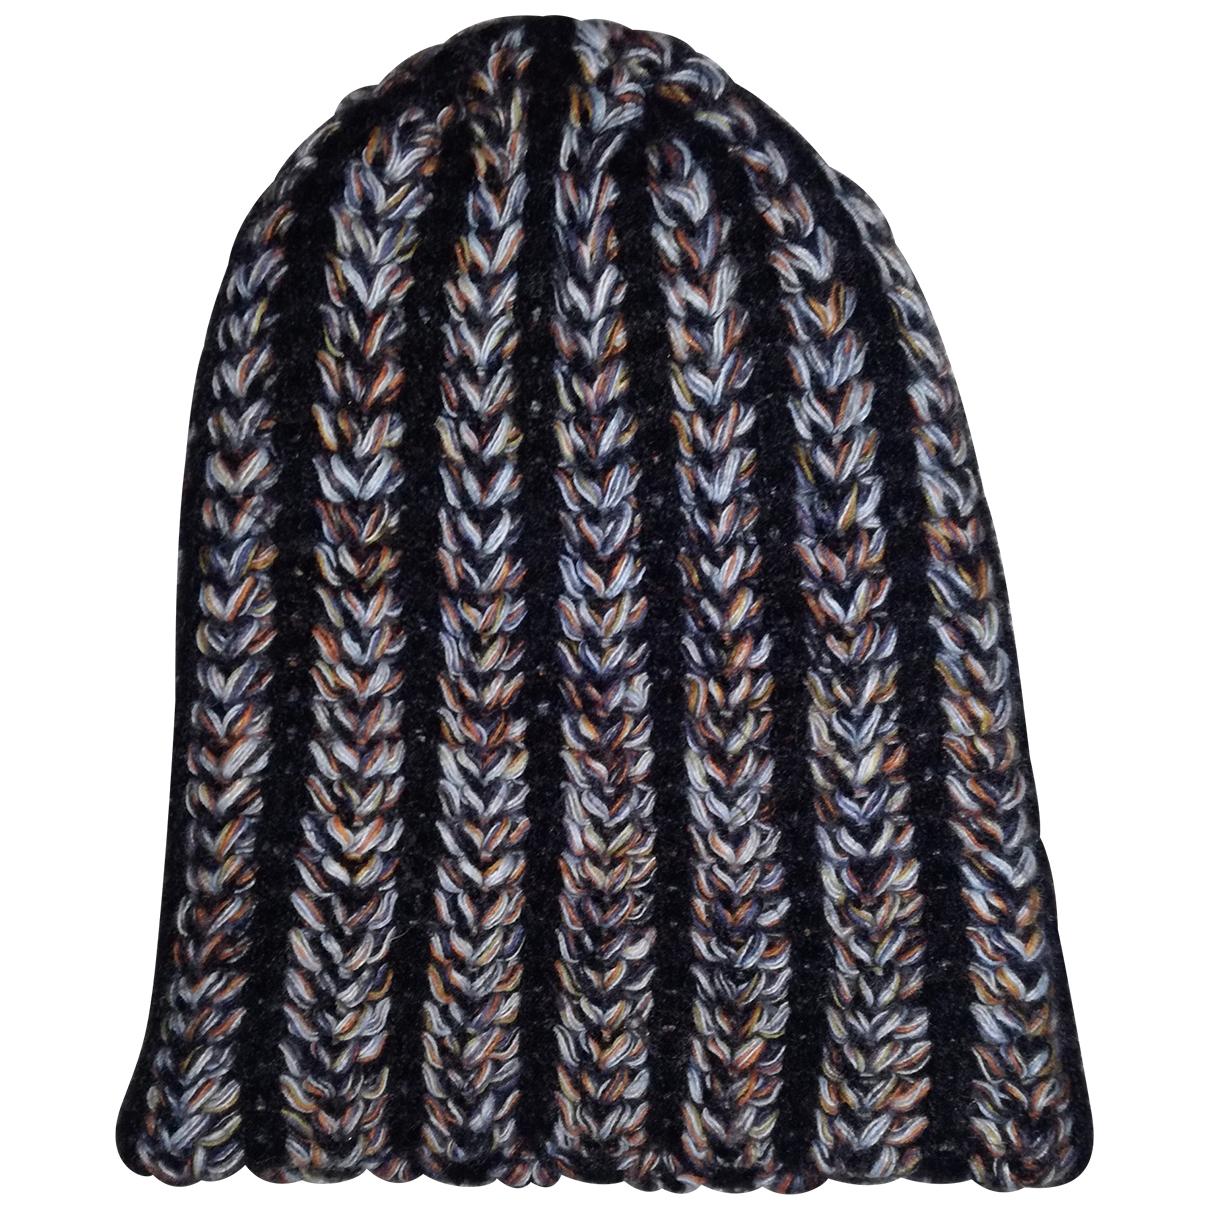 Missoni \N Multicolour Wool hat for Women S International